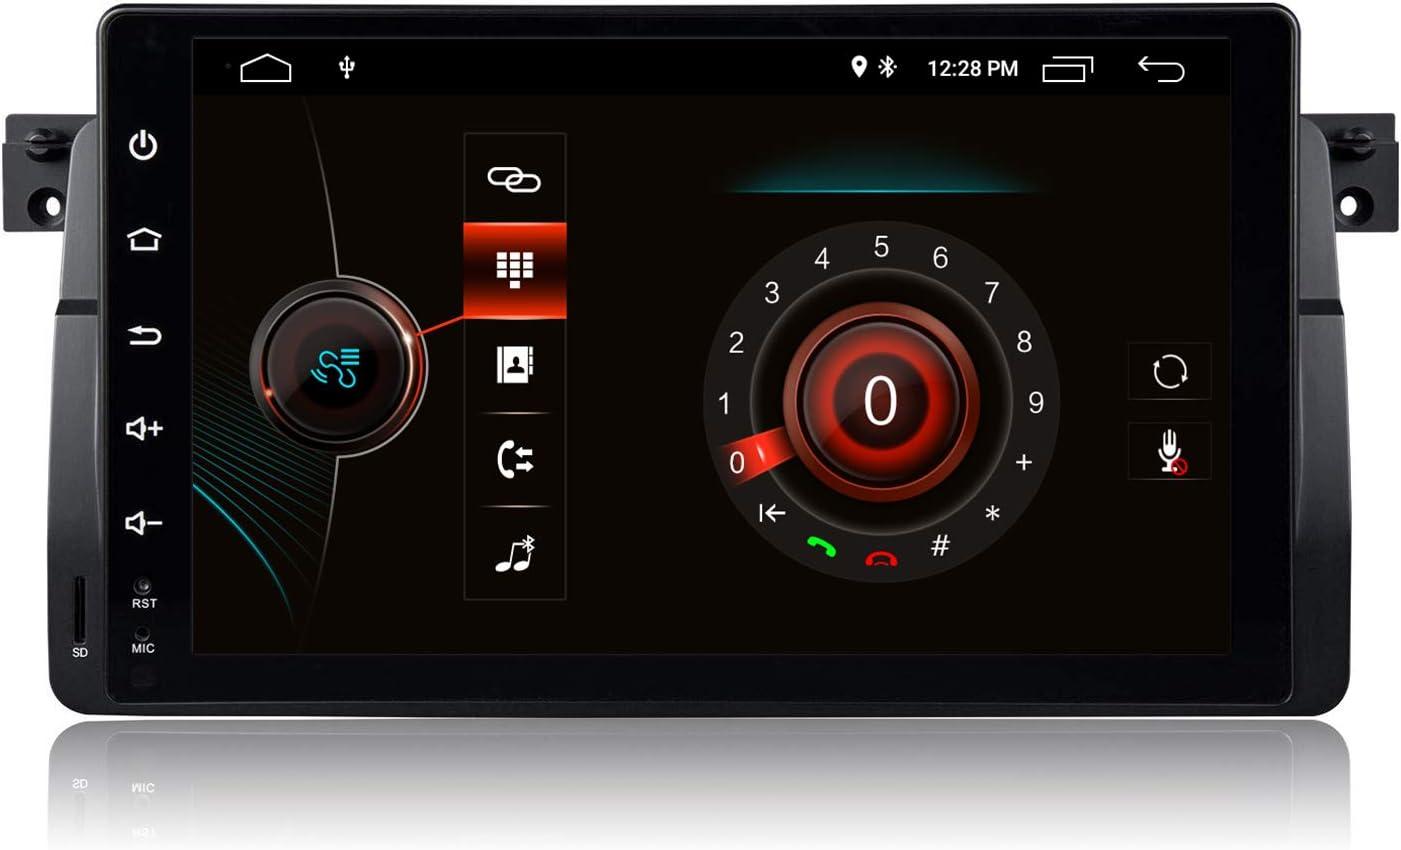 9 Pulgadas Android 10 Autoradio 1 DIN Estéreo de Coche para BMW E46 M3 Rover 75 MG ZT Sedan Soporte AHD Cámara de Vista Trasera GPS Radio Audio Video Bluetooth Am PM WiFi SWC DSP Dab+,2+80GB